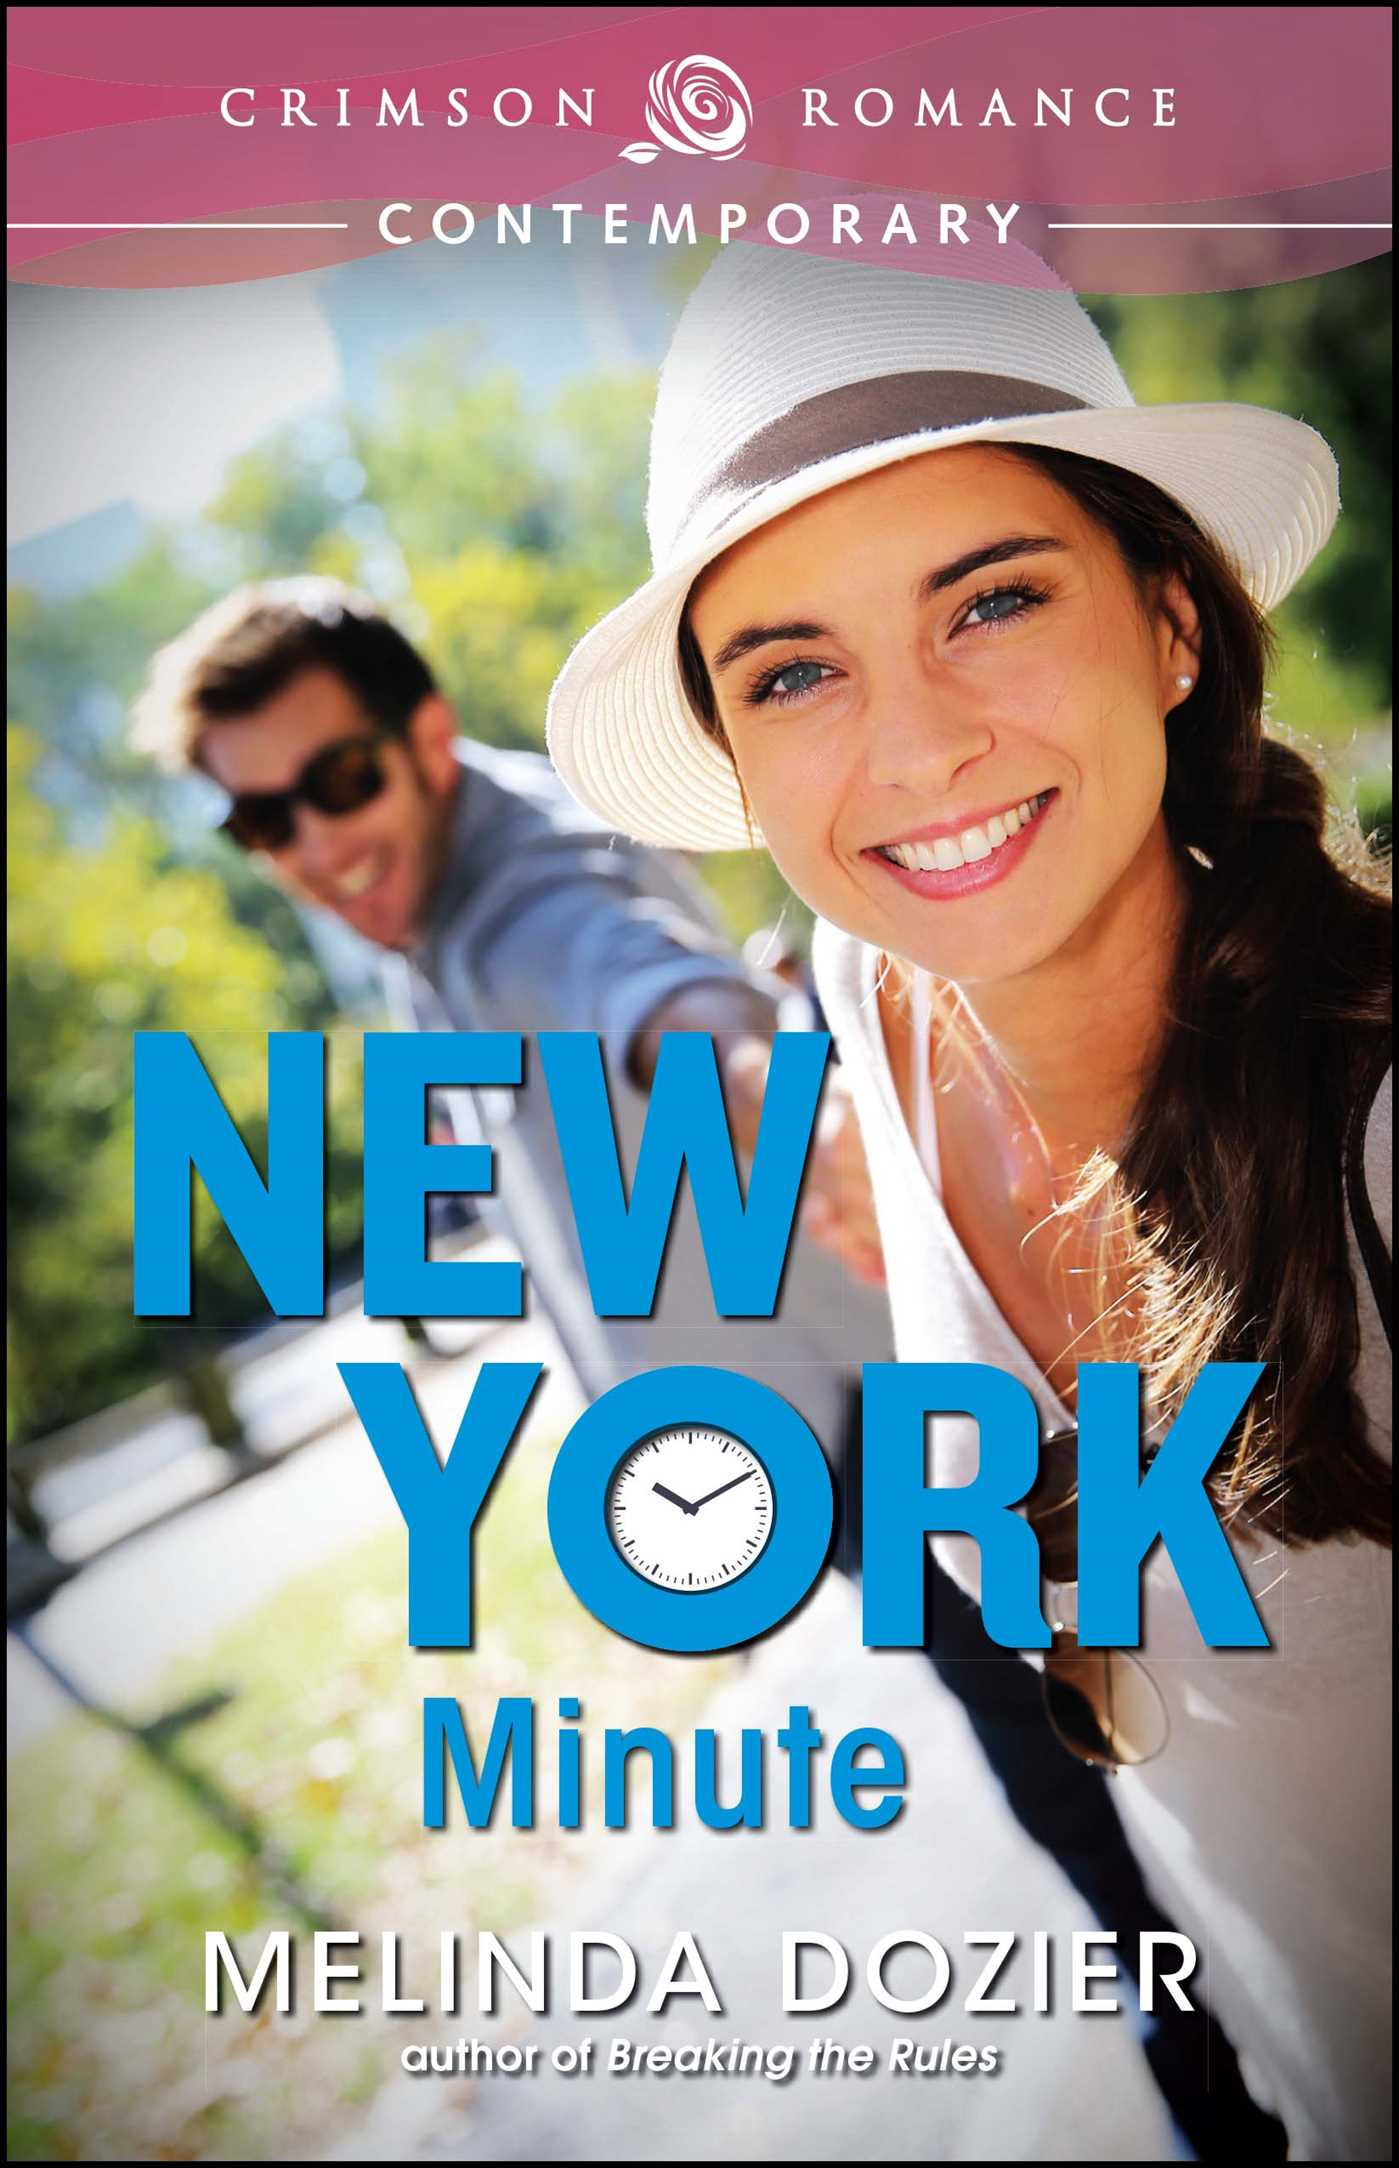 New york minute 9781440589119 hr